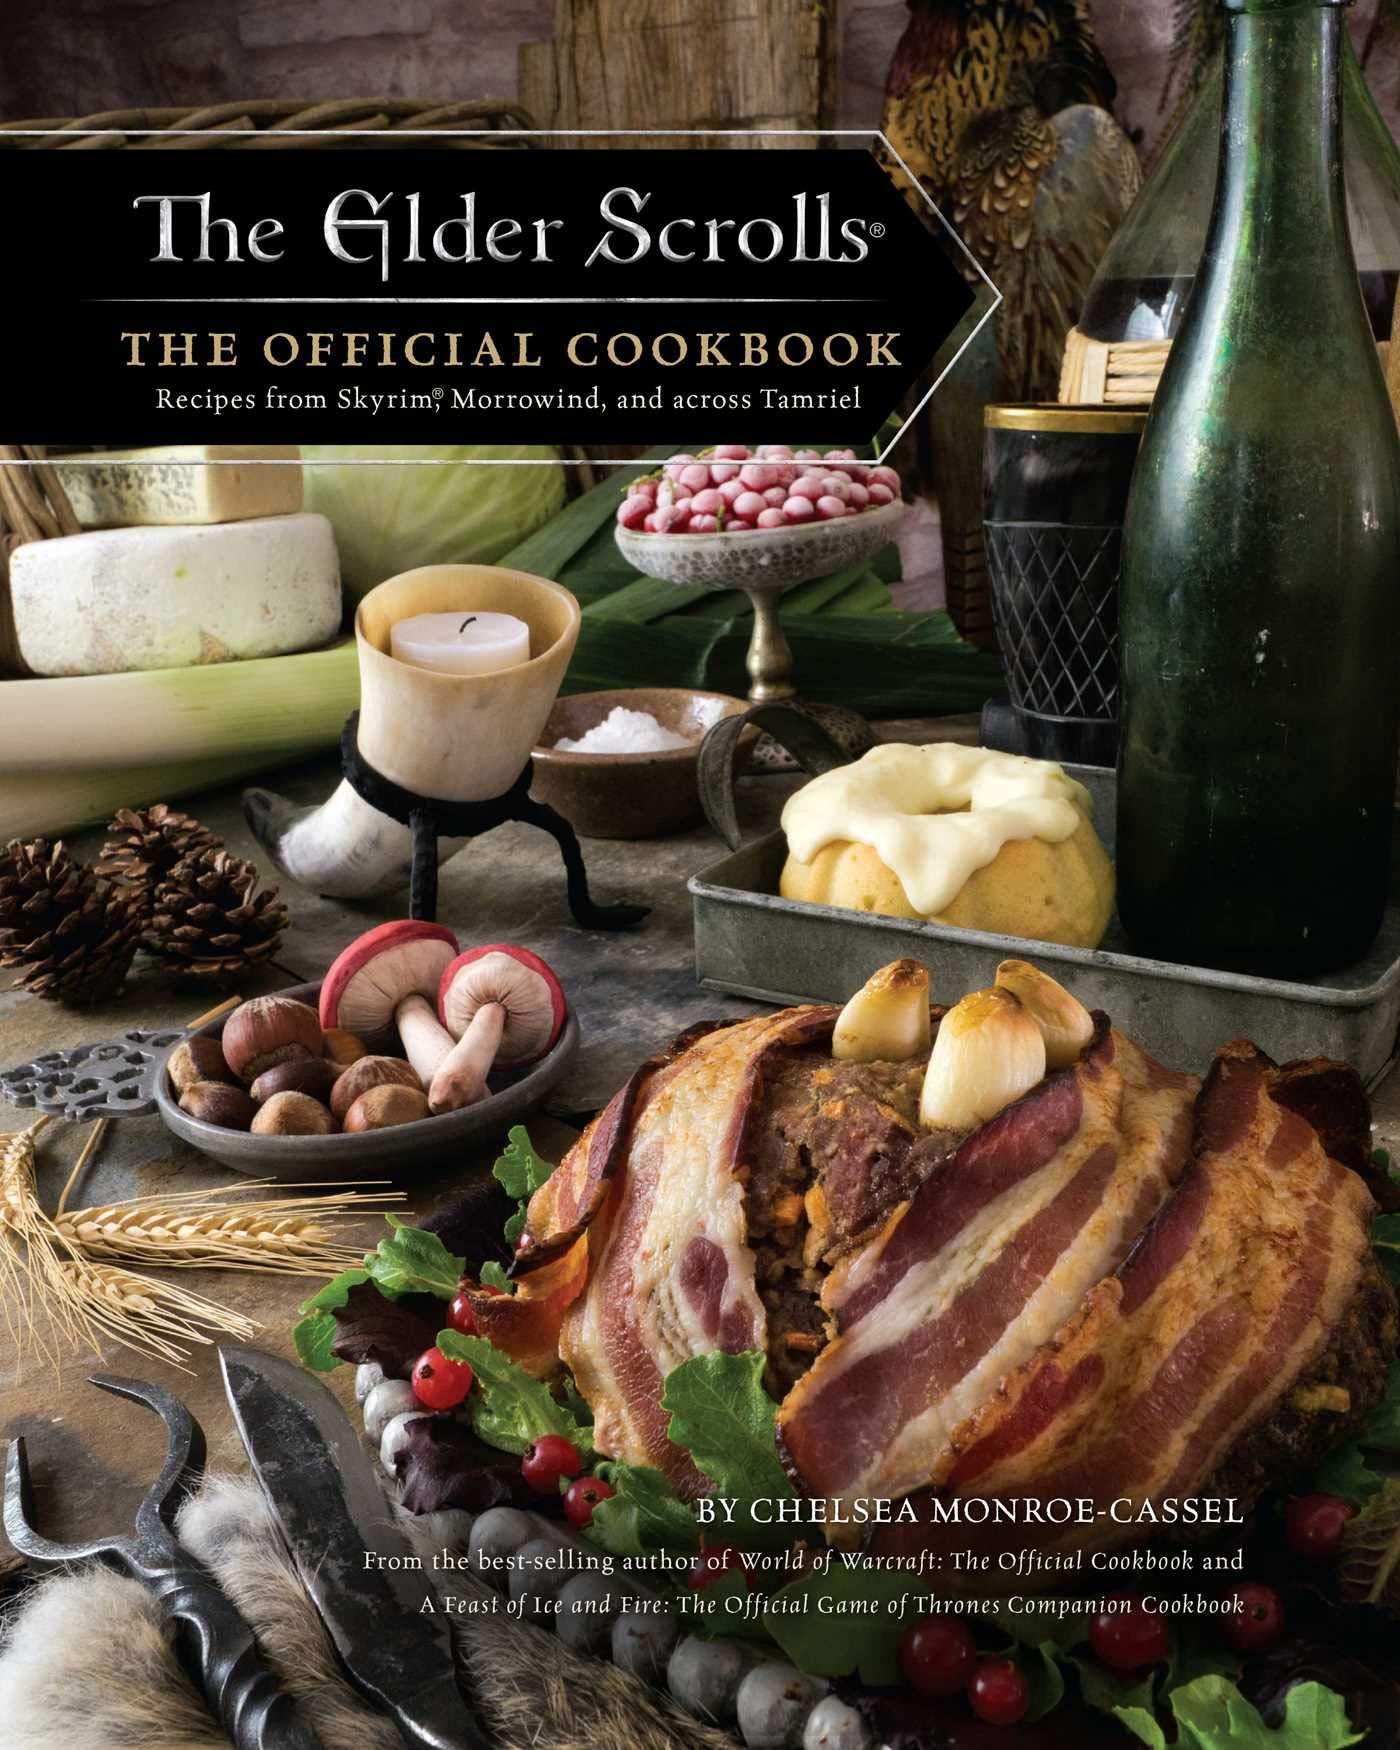 The Elder Scrolls: The Official Cookbook